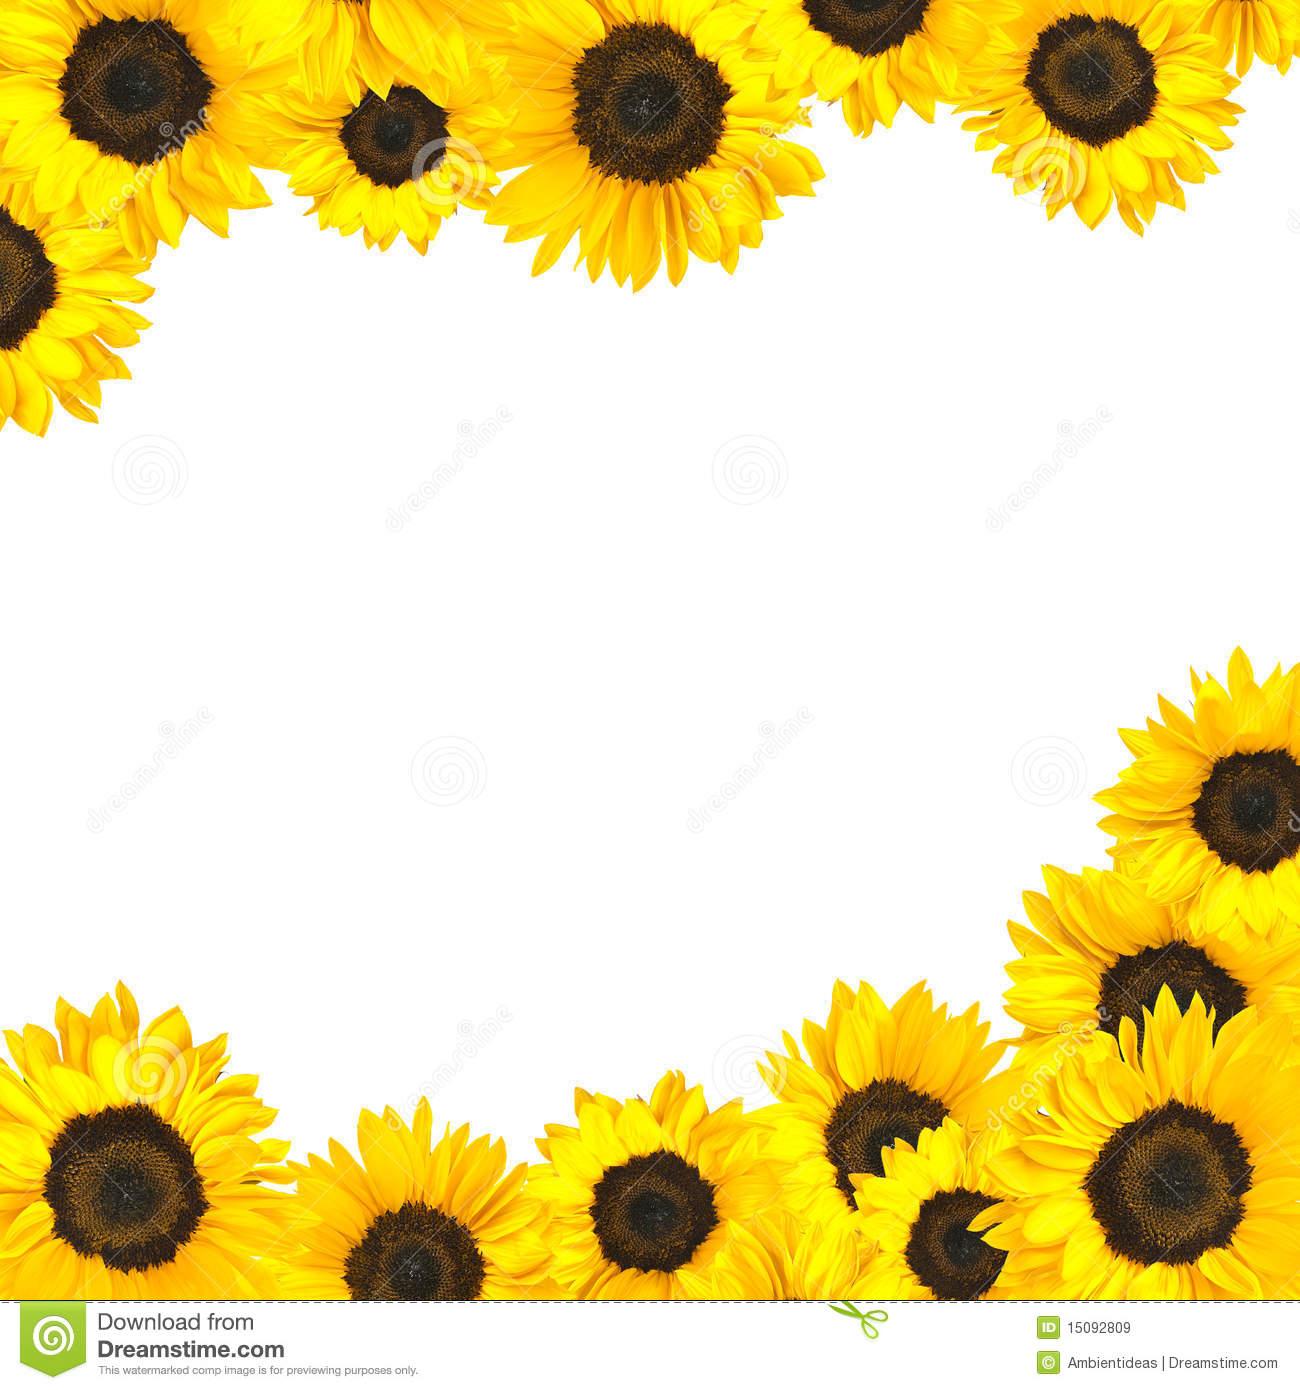 Sunflower Printable Clipart - Clipart Kid